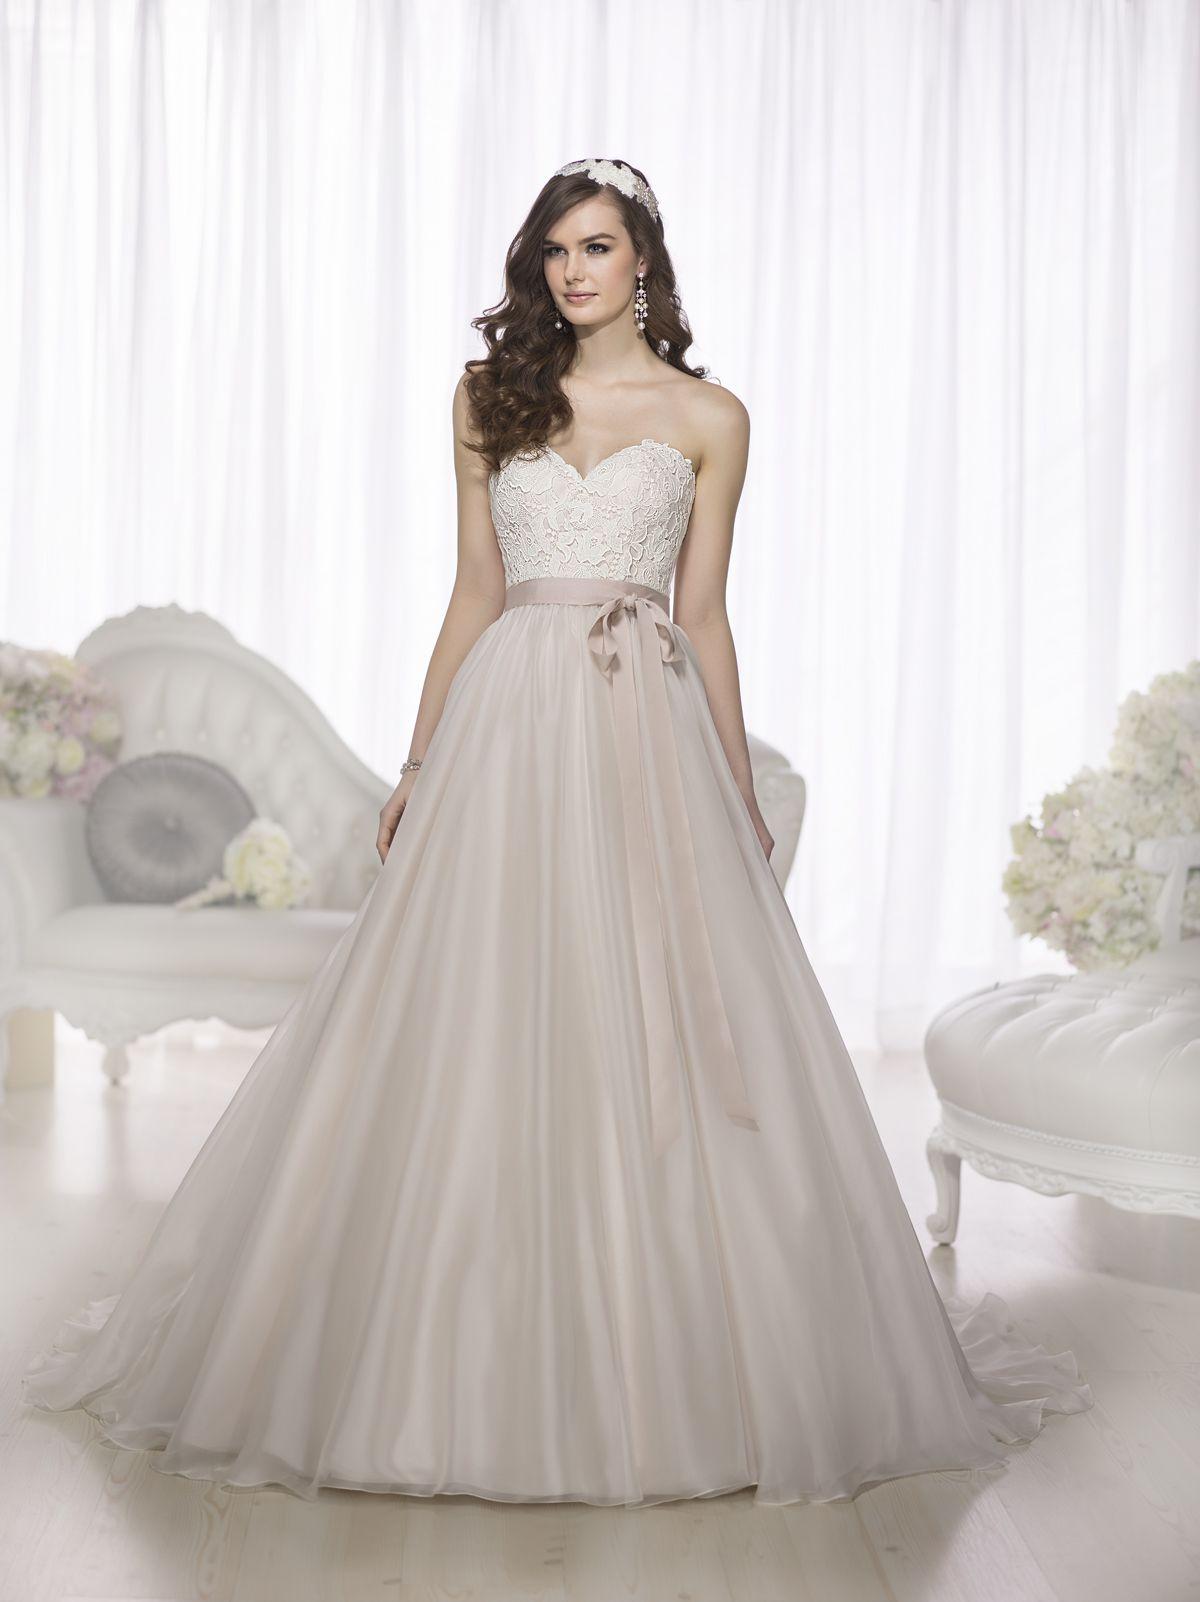 Superb Essense of Australia Wedding Dresses